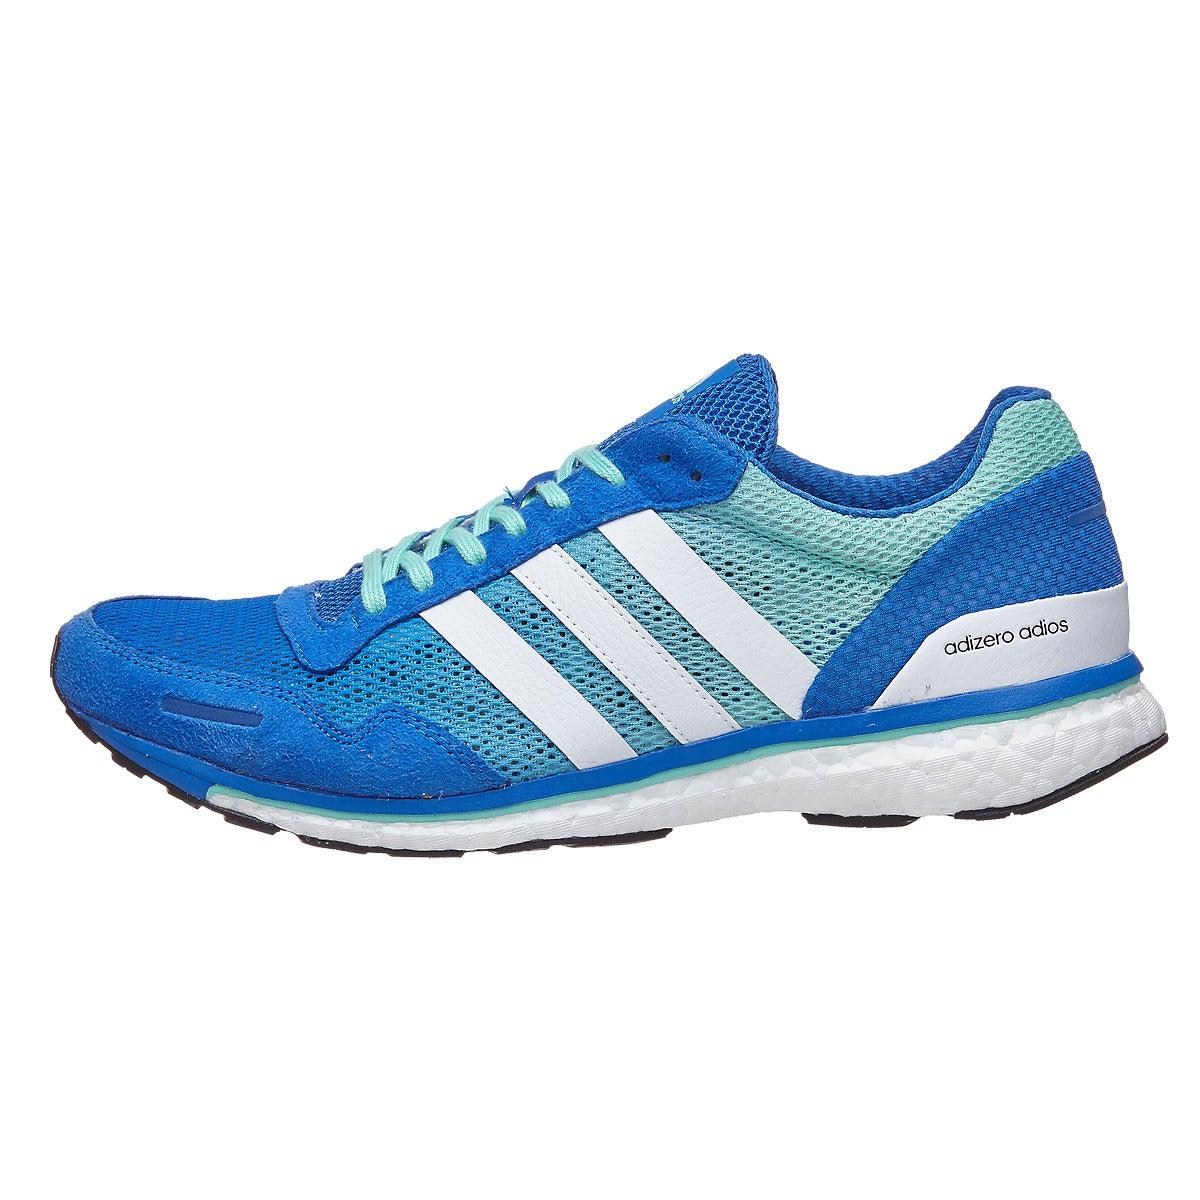 adidas adizero adios 3 Men's Shoes Blue 360° View